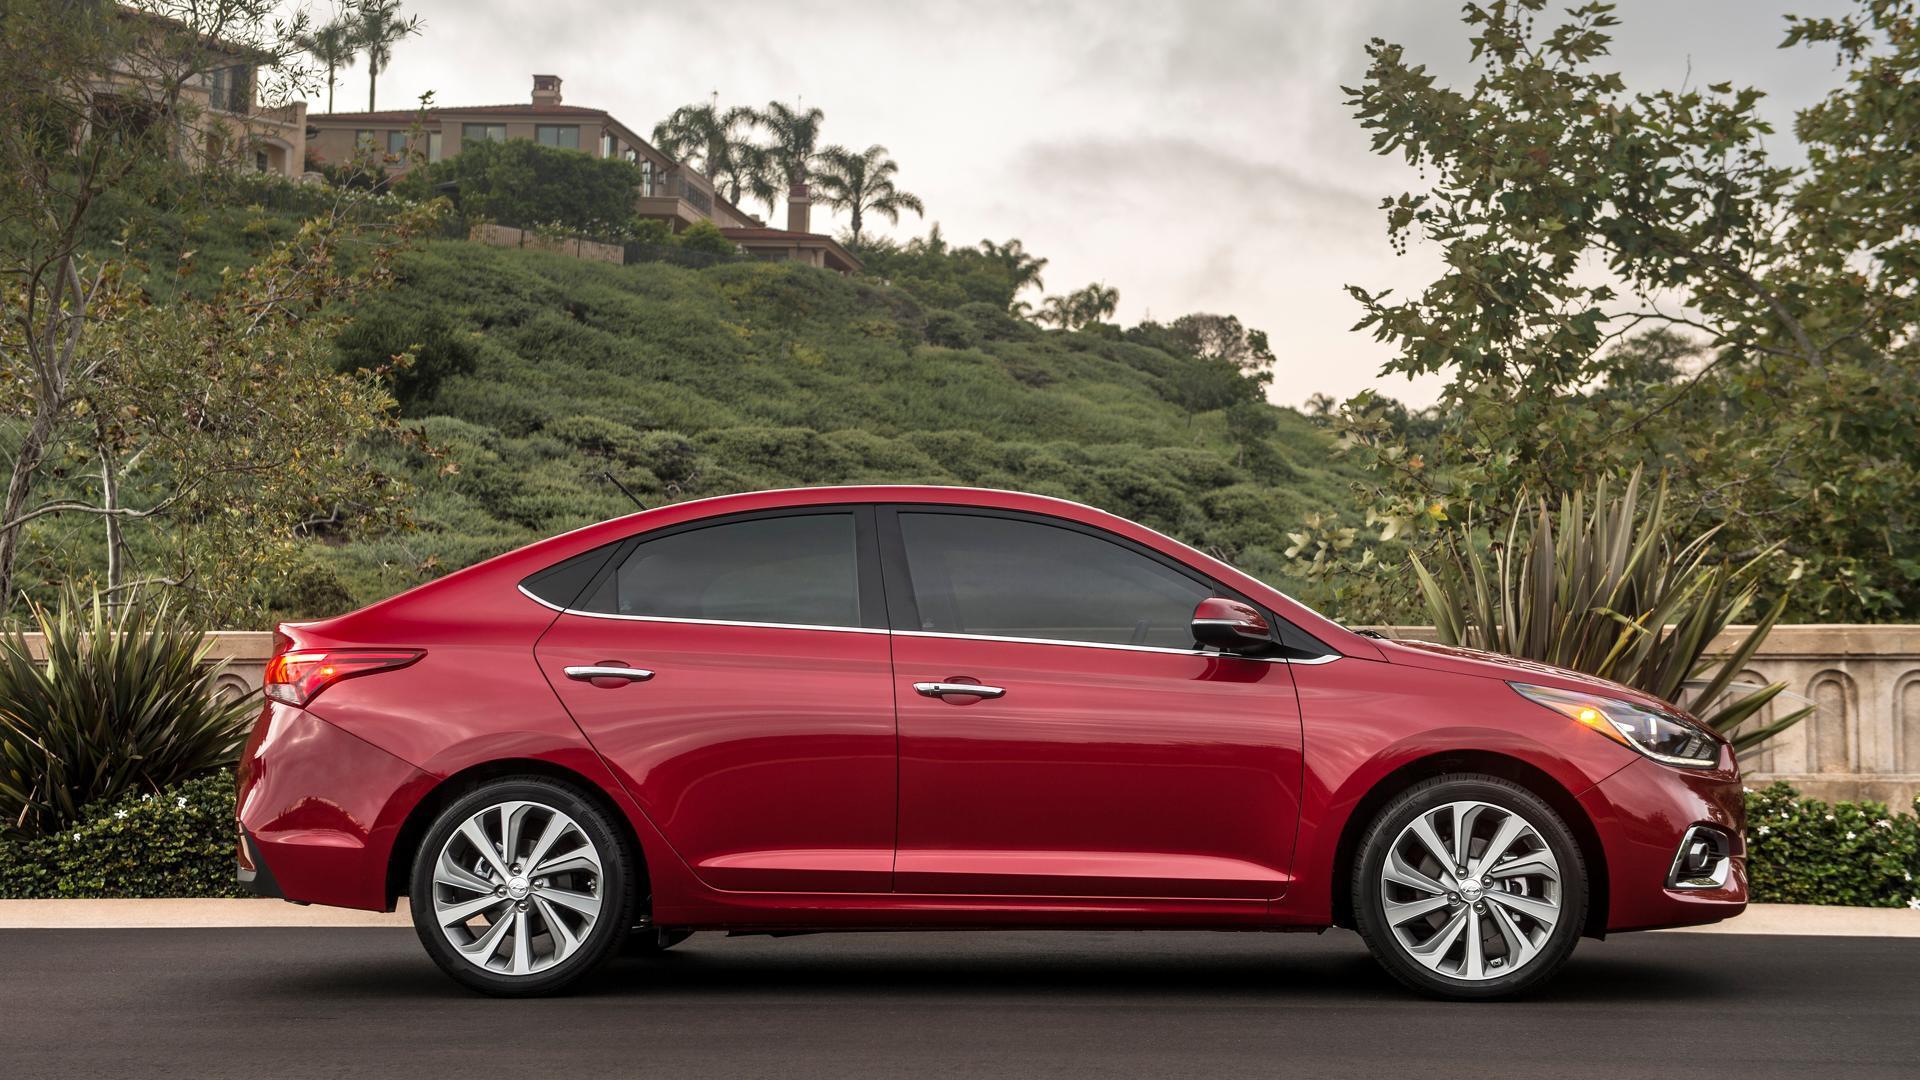 Hyundai лишил Solaris механической коробки передач